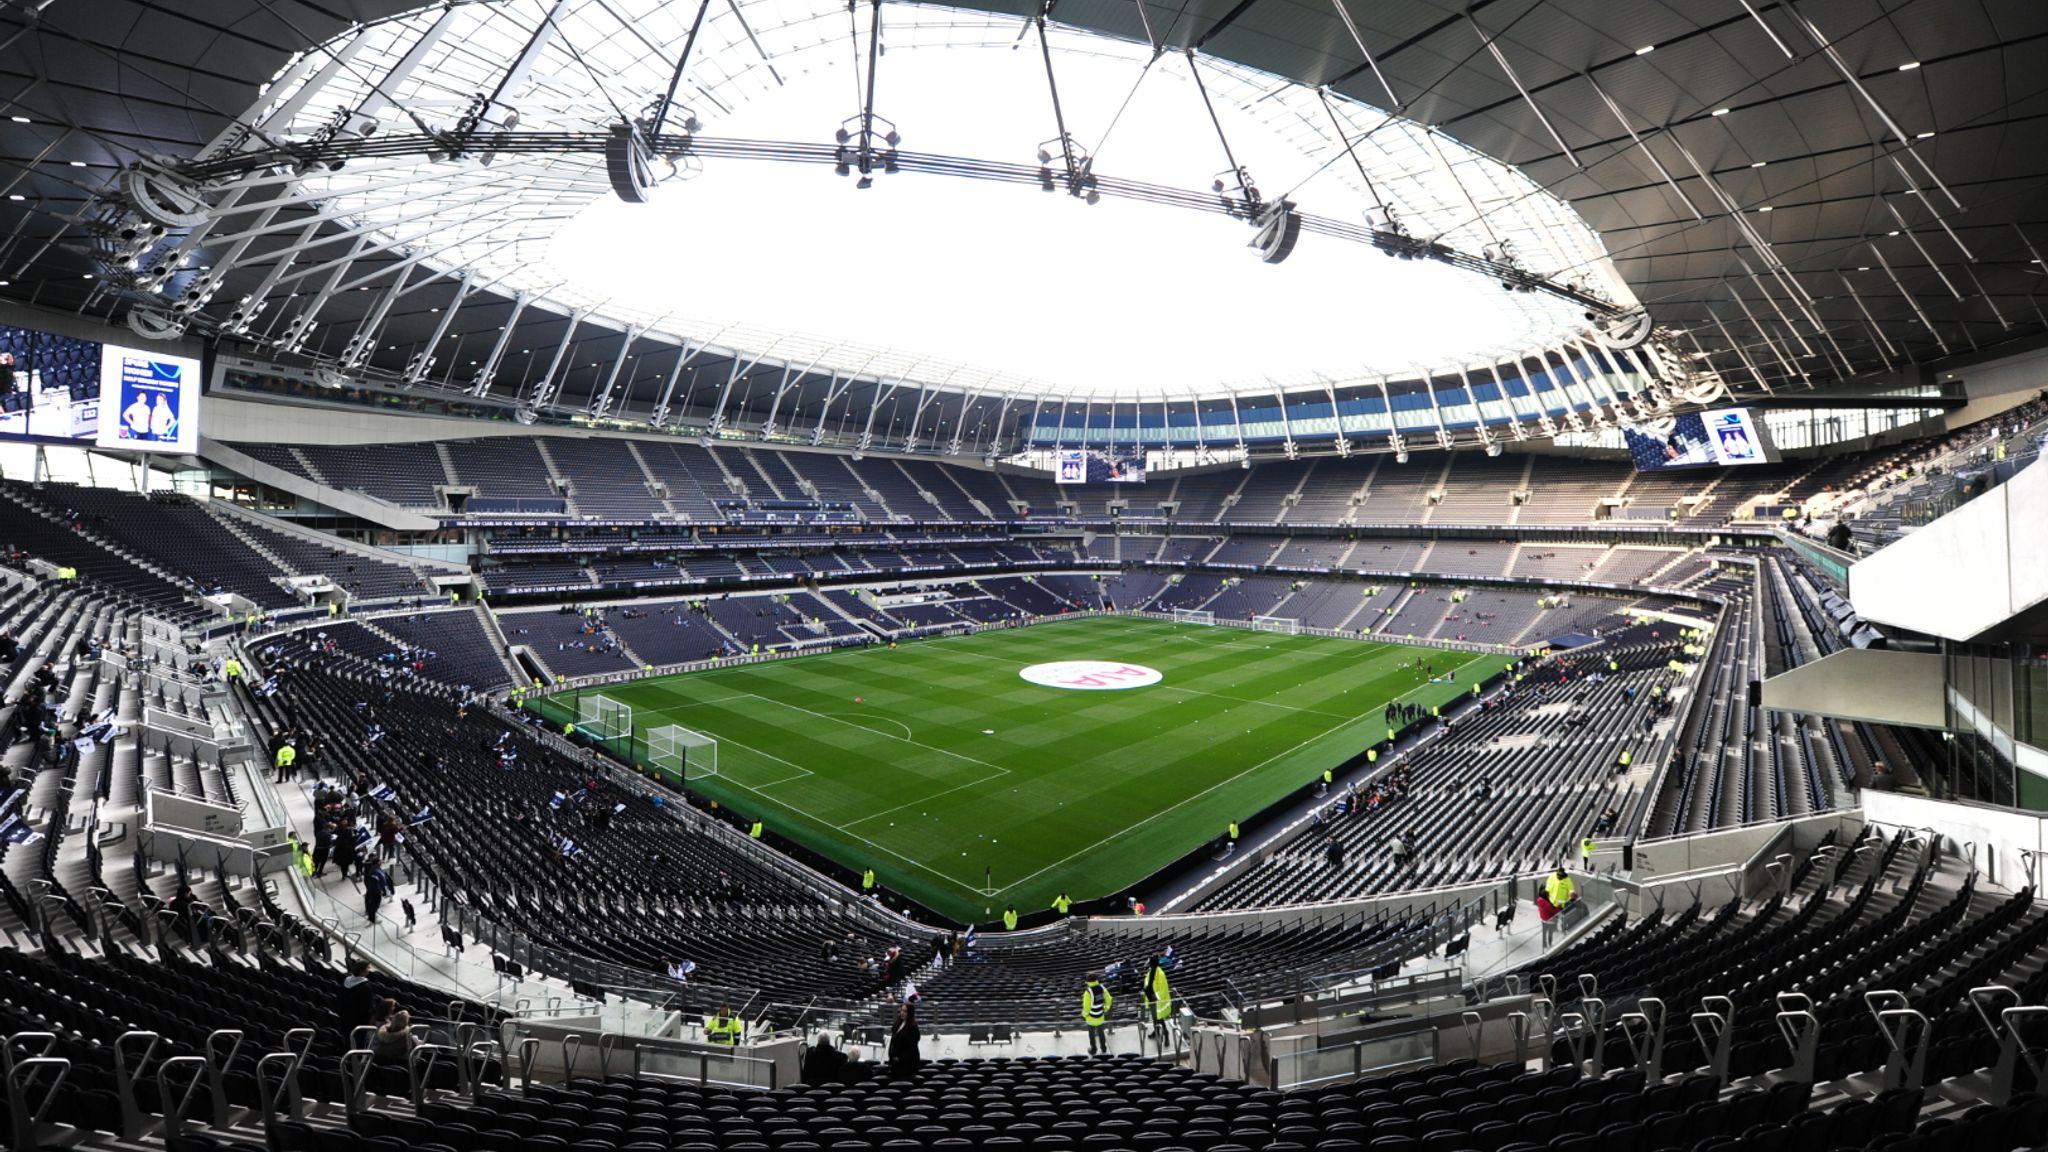 Coronavirus Tottenham Stadium To Offer Nhs Services After Criticism Of Club S Covid 19 Response Uk News Sky News